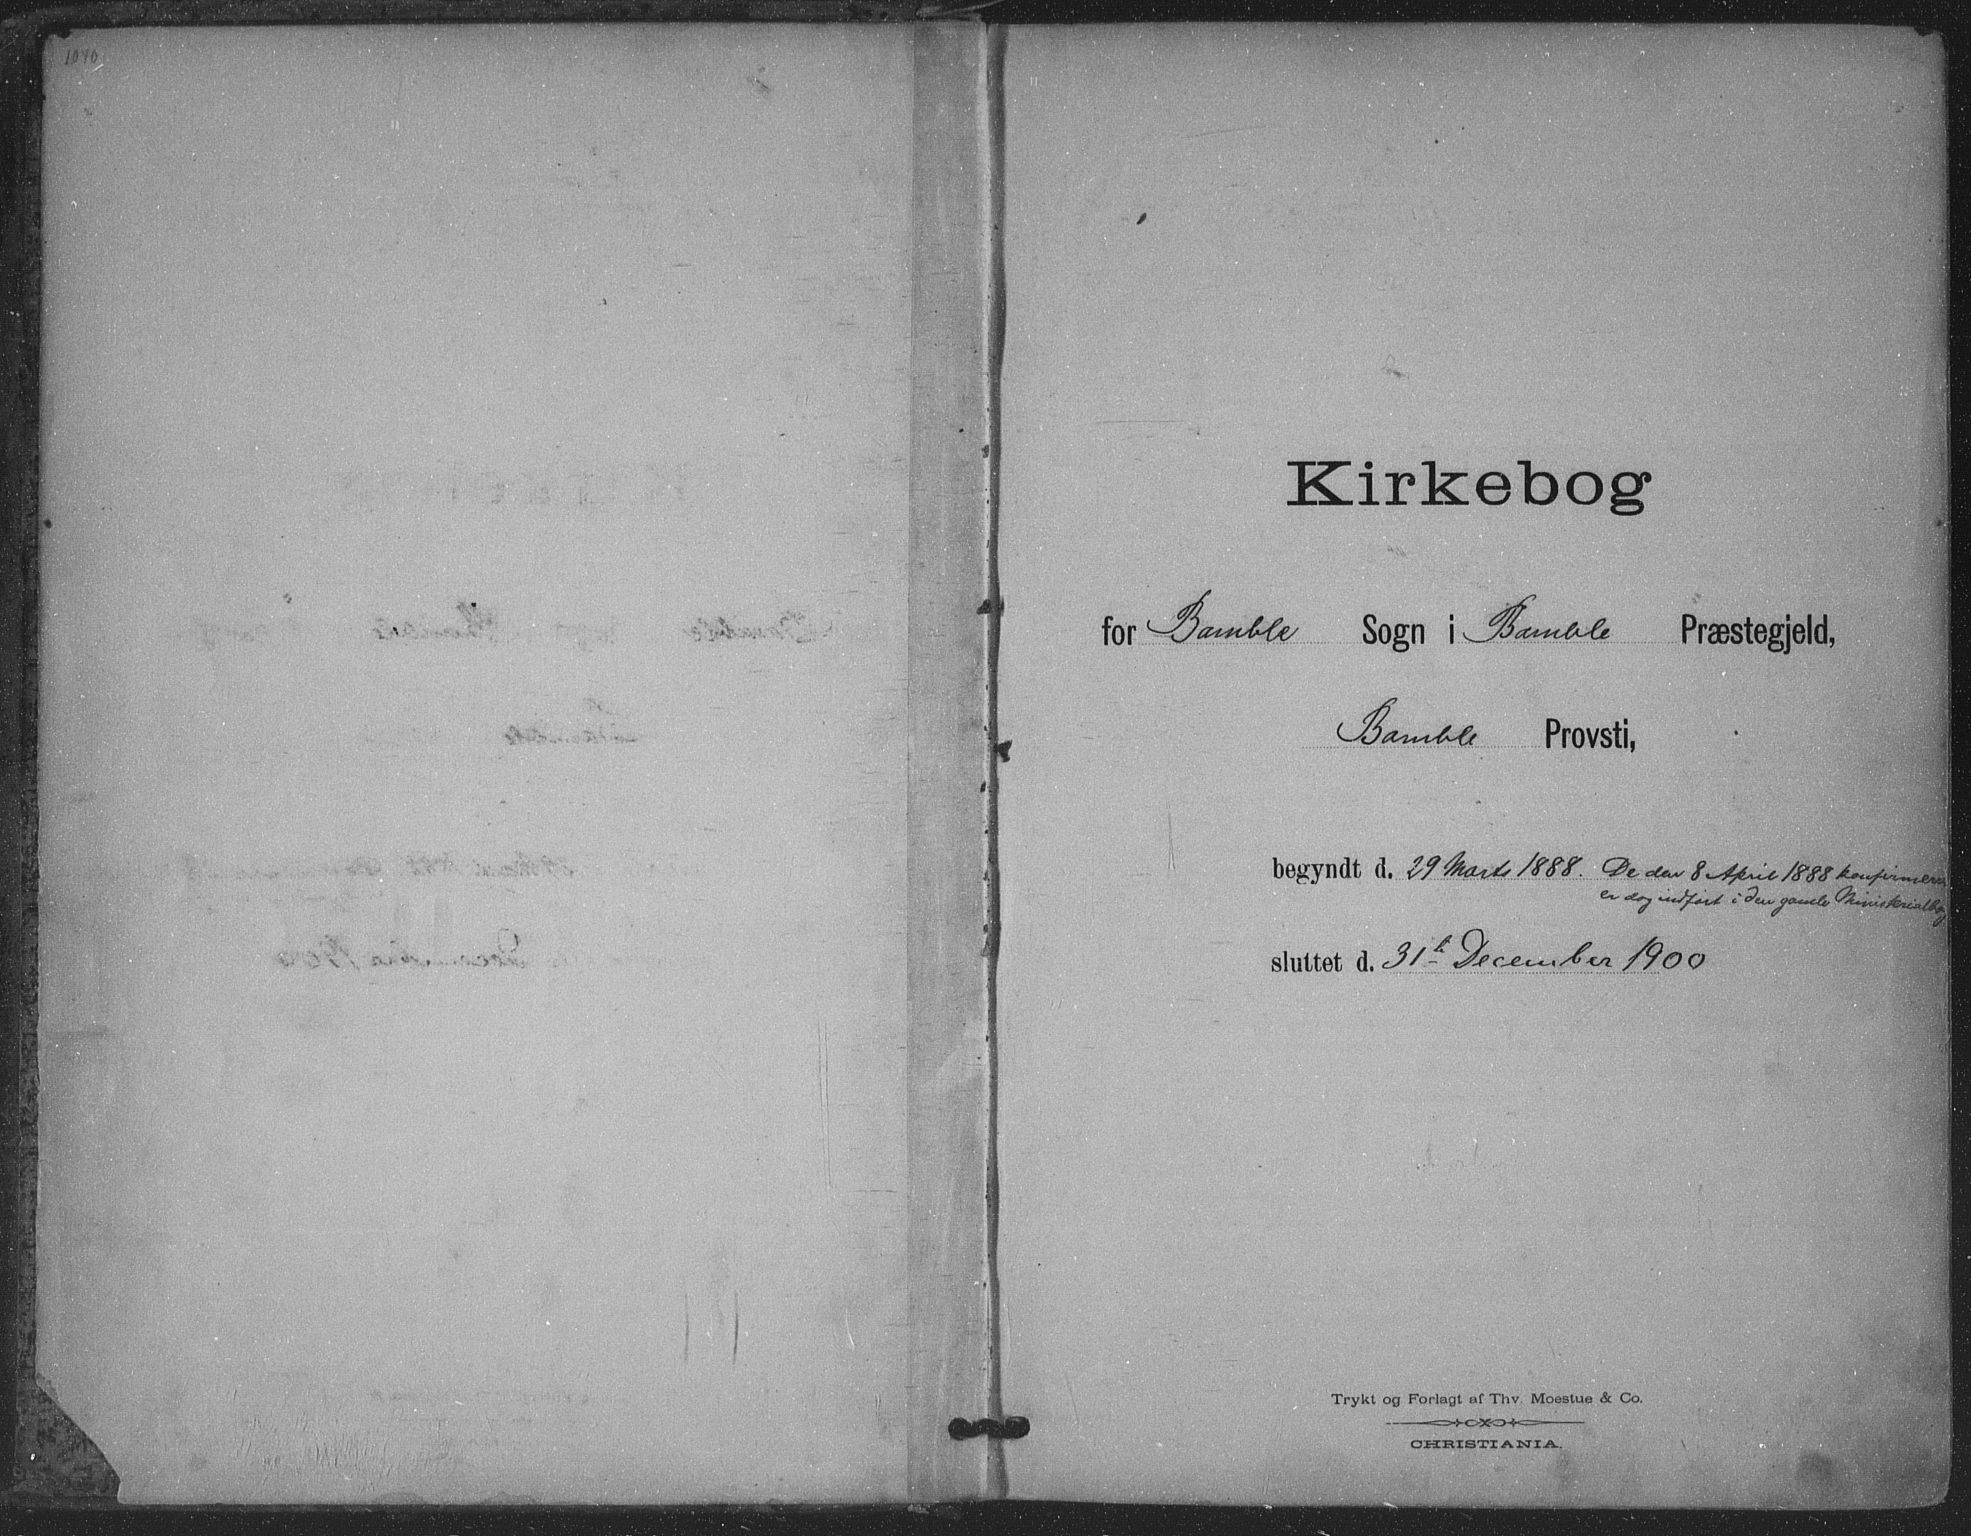 SAKO, Bamble kirkebøker, F/Fa/L0008: Ministerialbok nr. I 8, 1888-1900